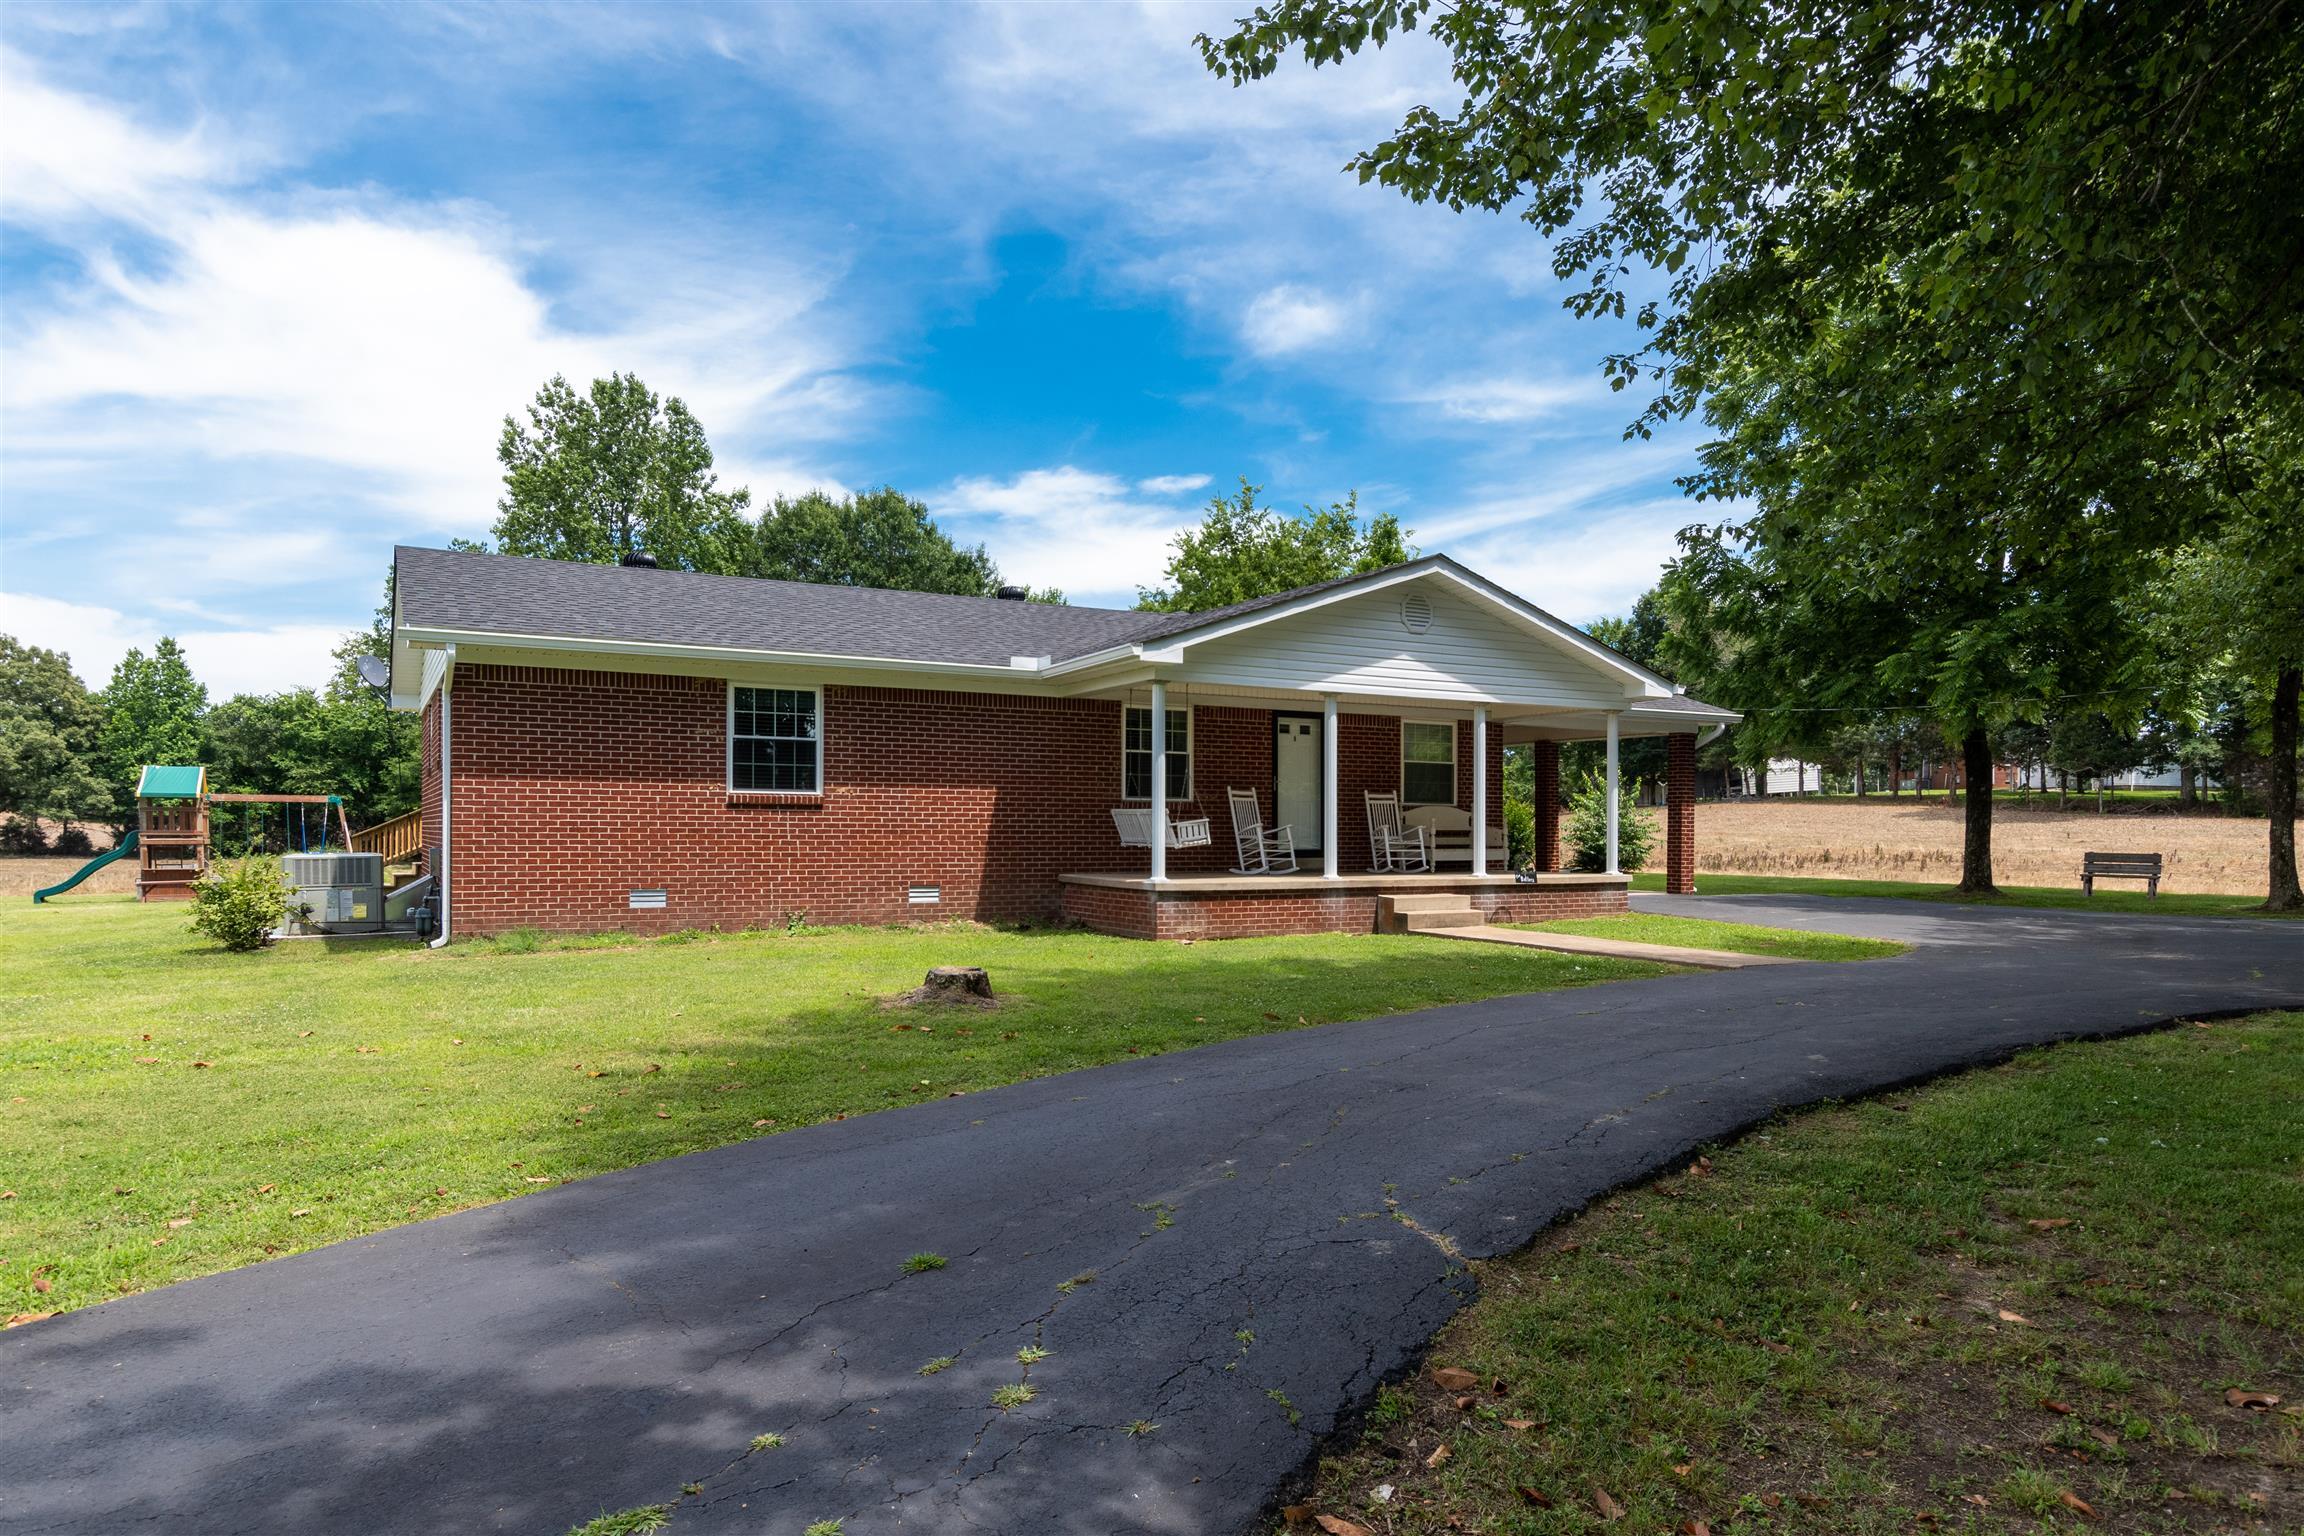 88 Cub Creek Hall Rd, Parsons, TN 38363 - Parsons, TN real estate listing